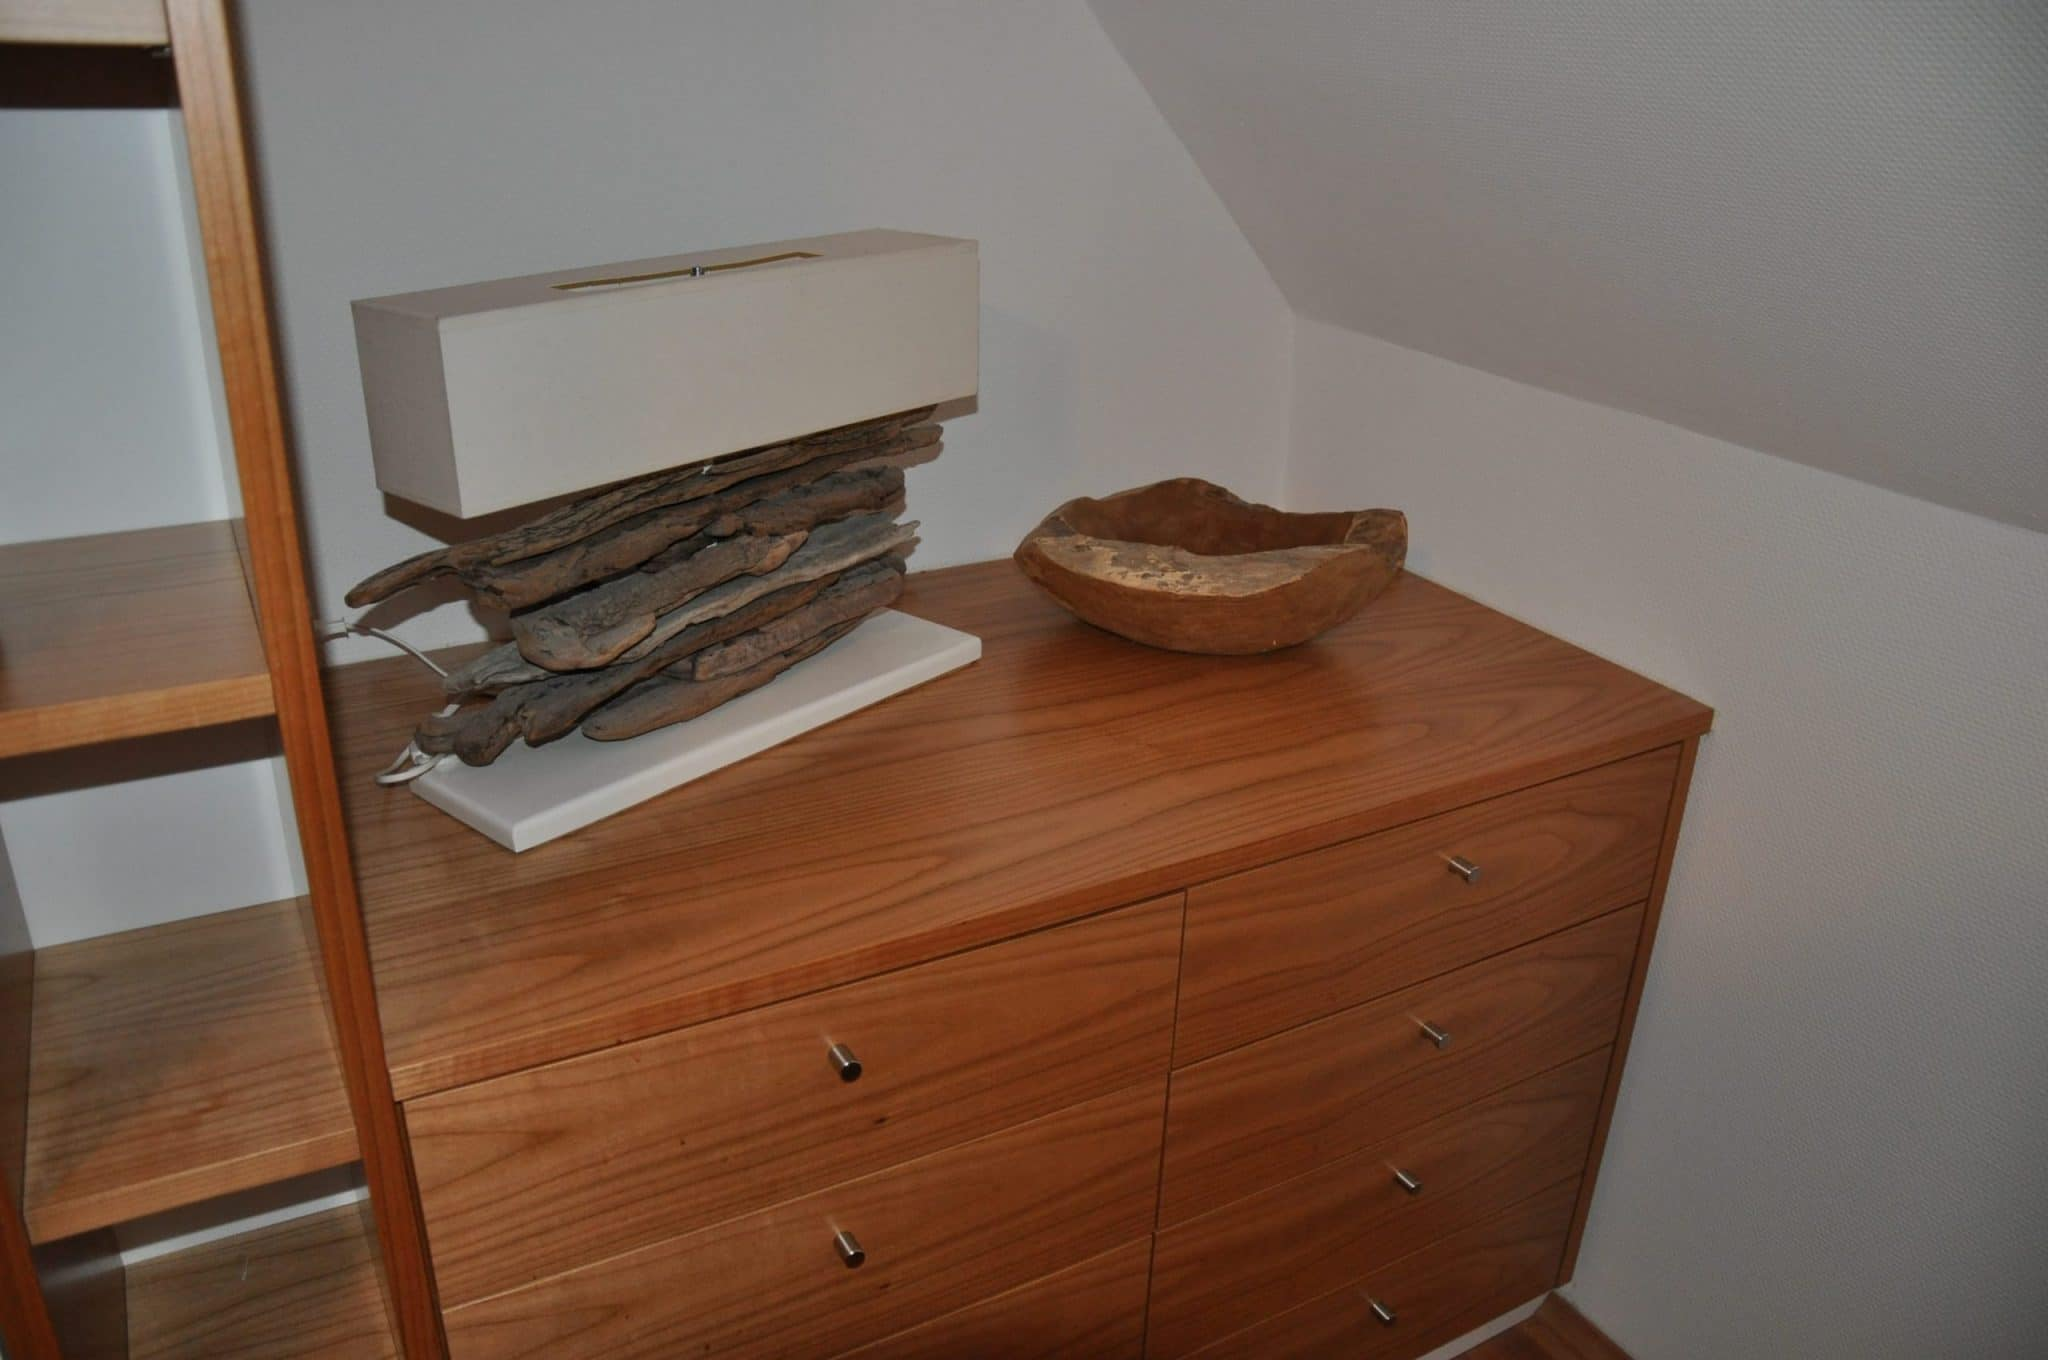 tischlerei-hanses-essen-moebel-handwerk-schlafraum-7